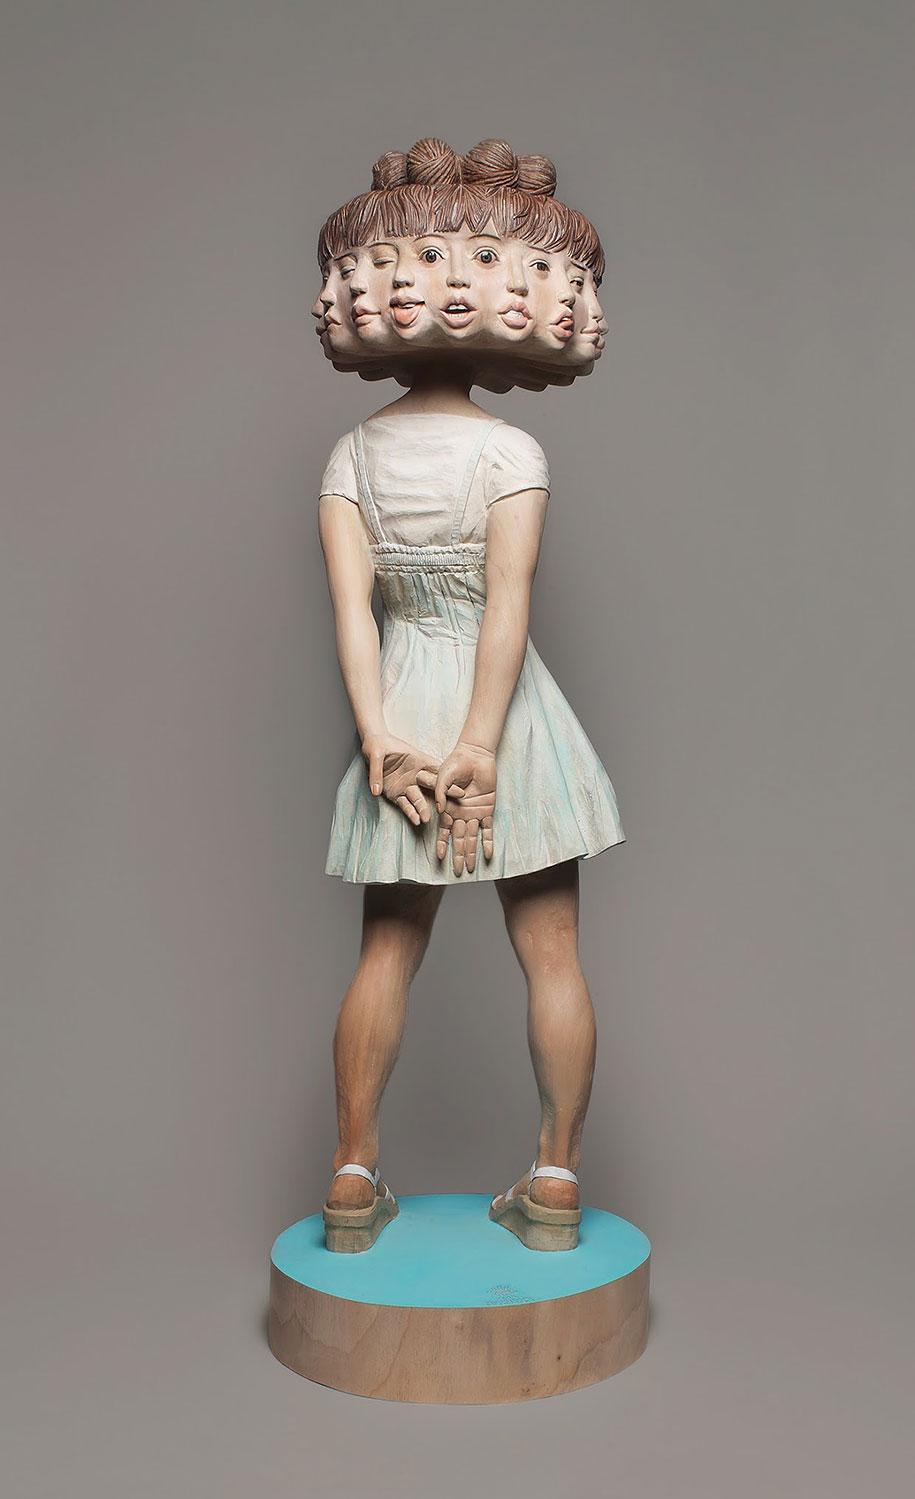 surreal-wooden-sculptures-yoshitoshi-kanemaki-32